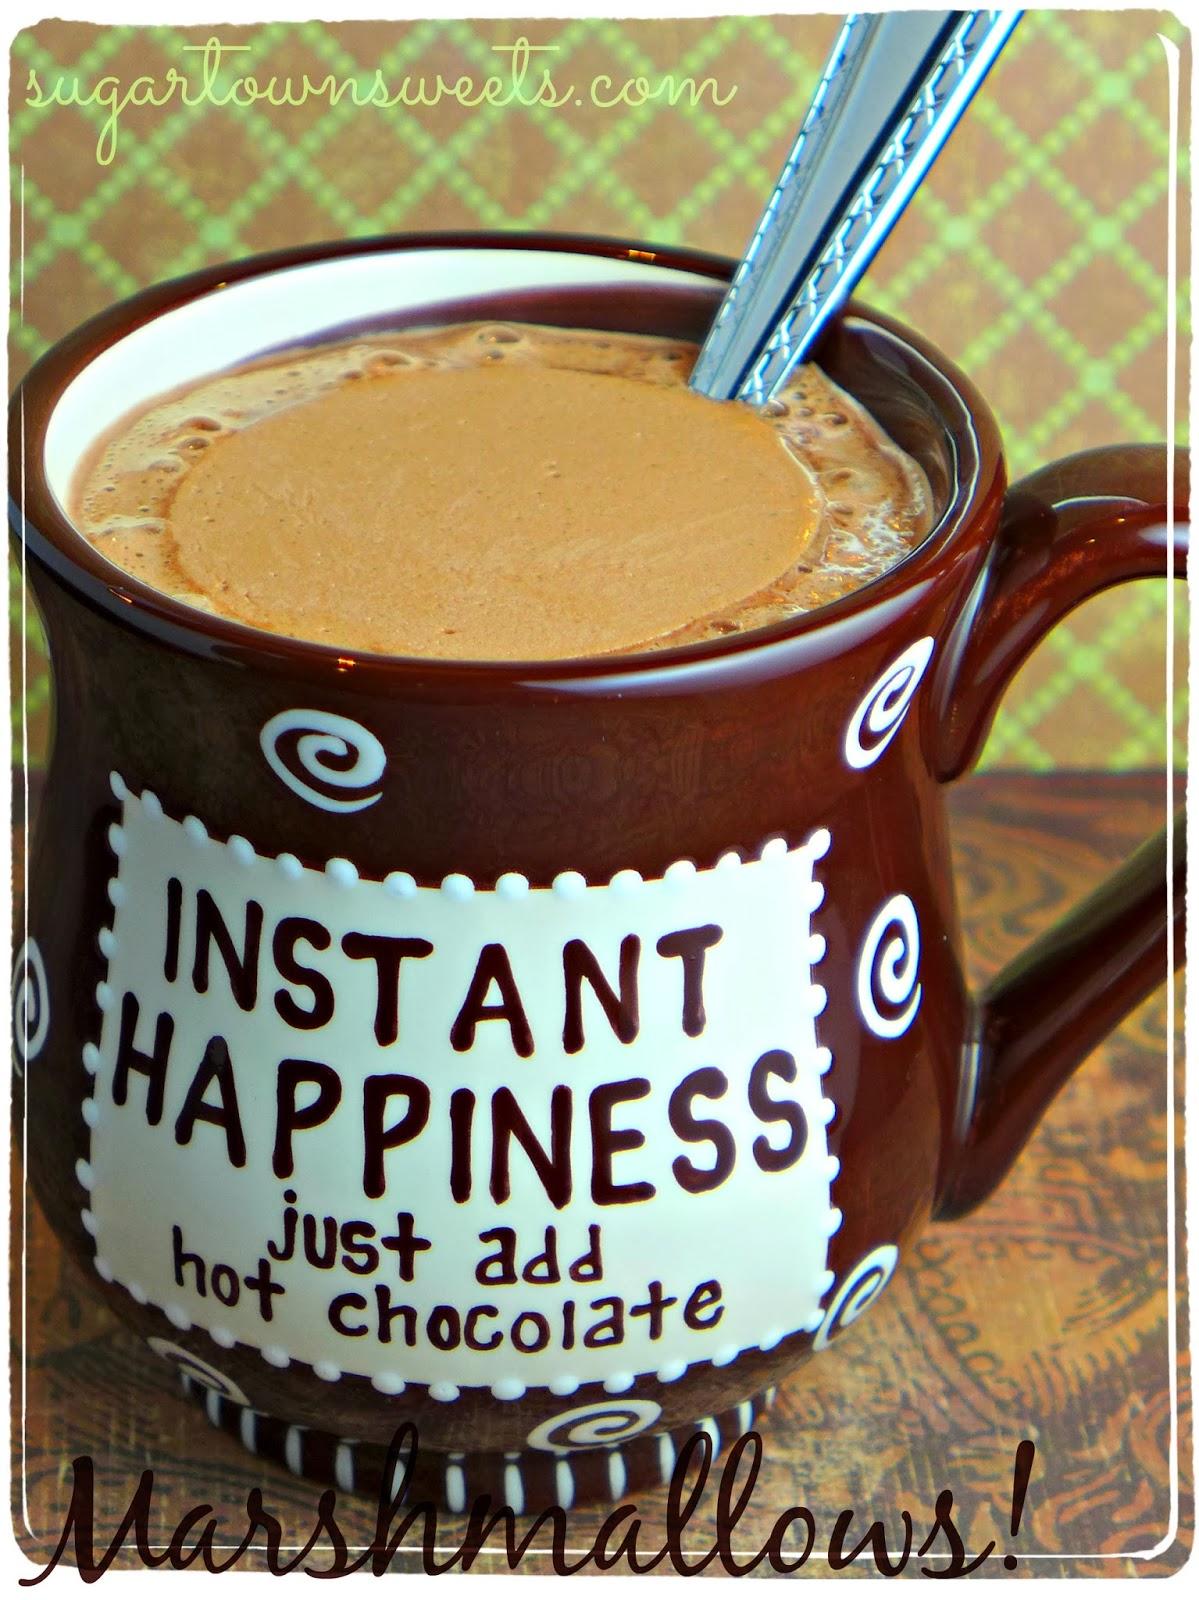 Sugartown Sweets Hot Chocolate Marshmallows